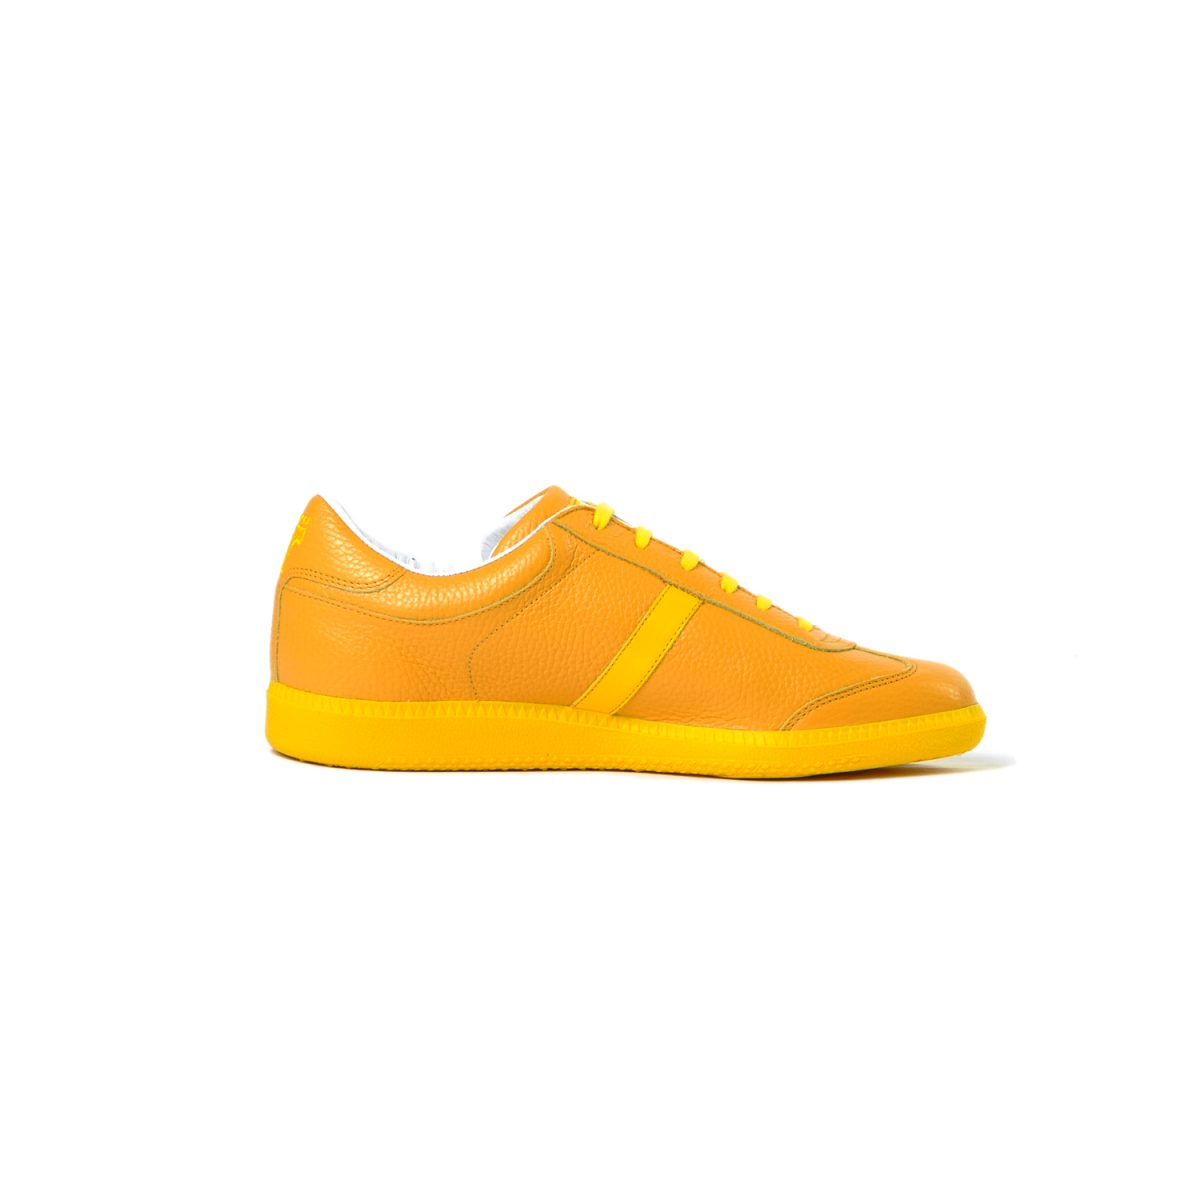 Tisza cipő - Compakt - Sárga